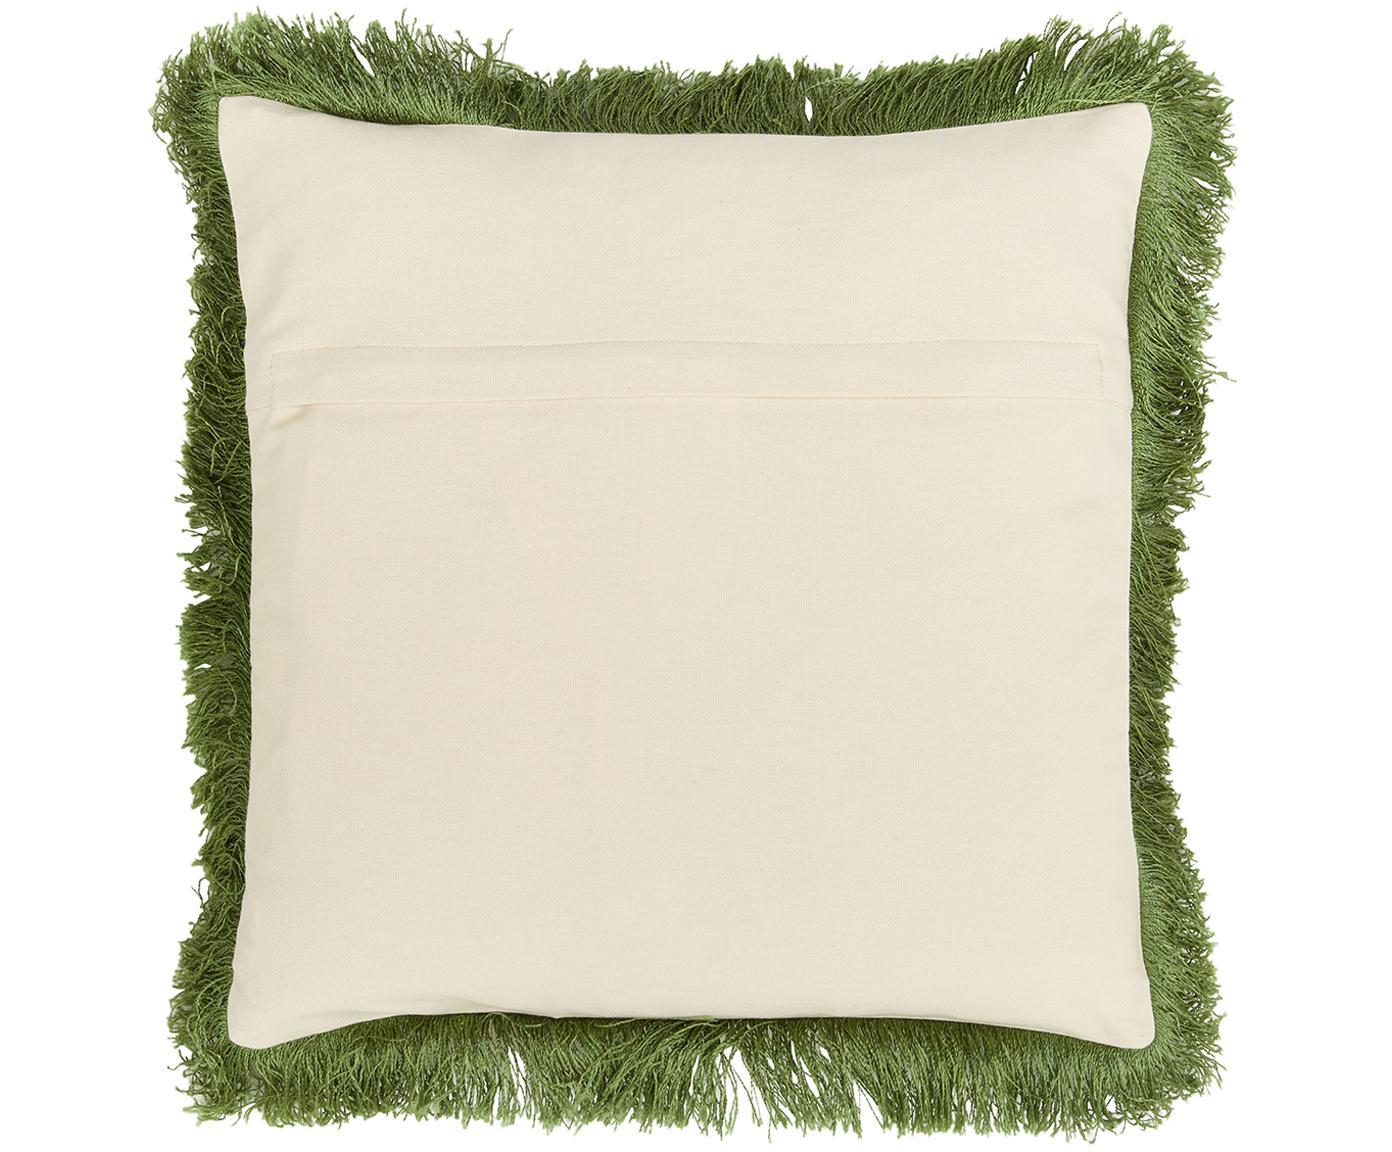 Kissenhülle Tropicana mit Fransen, Fransen: Viskose, MehrfarbigFransen: Dunkelgrün, 40 x 40 cm